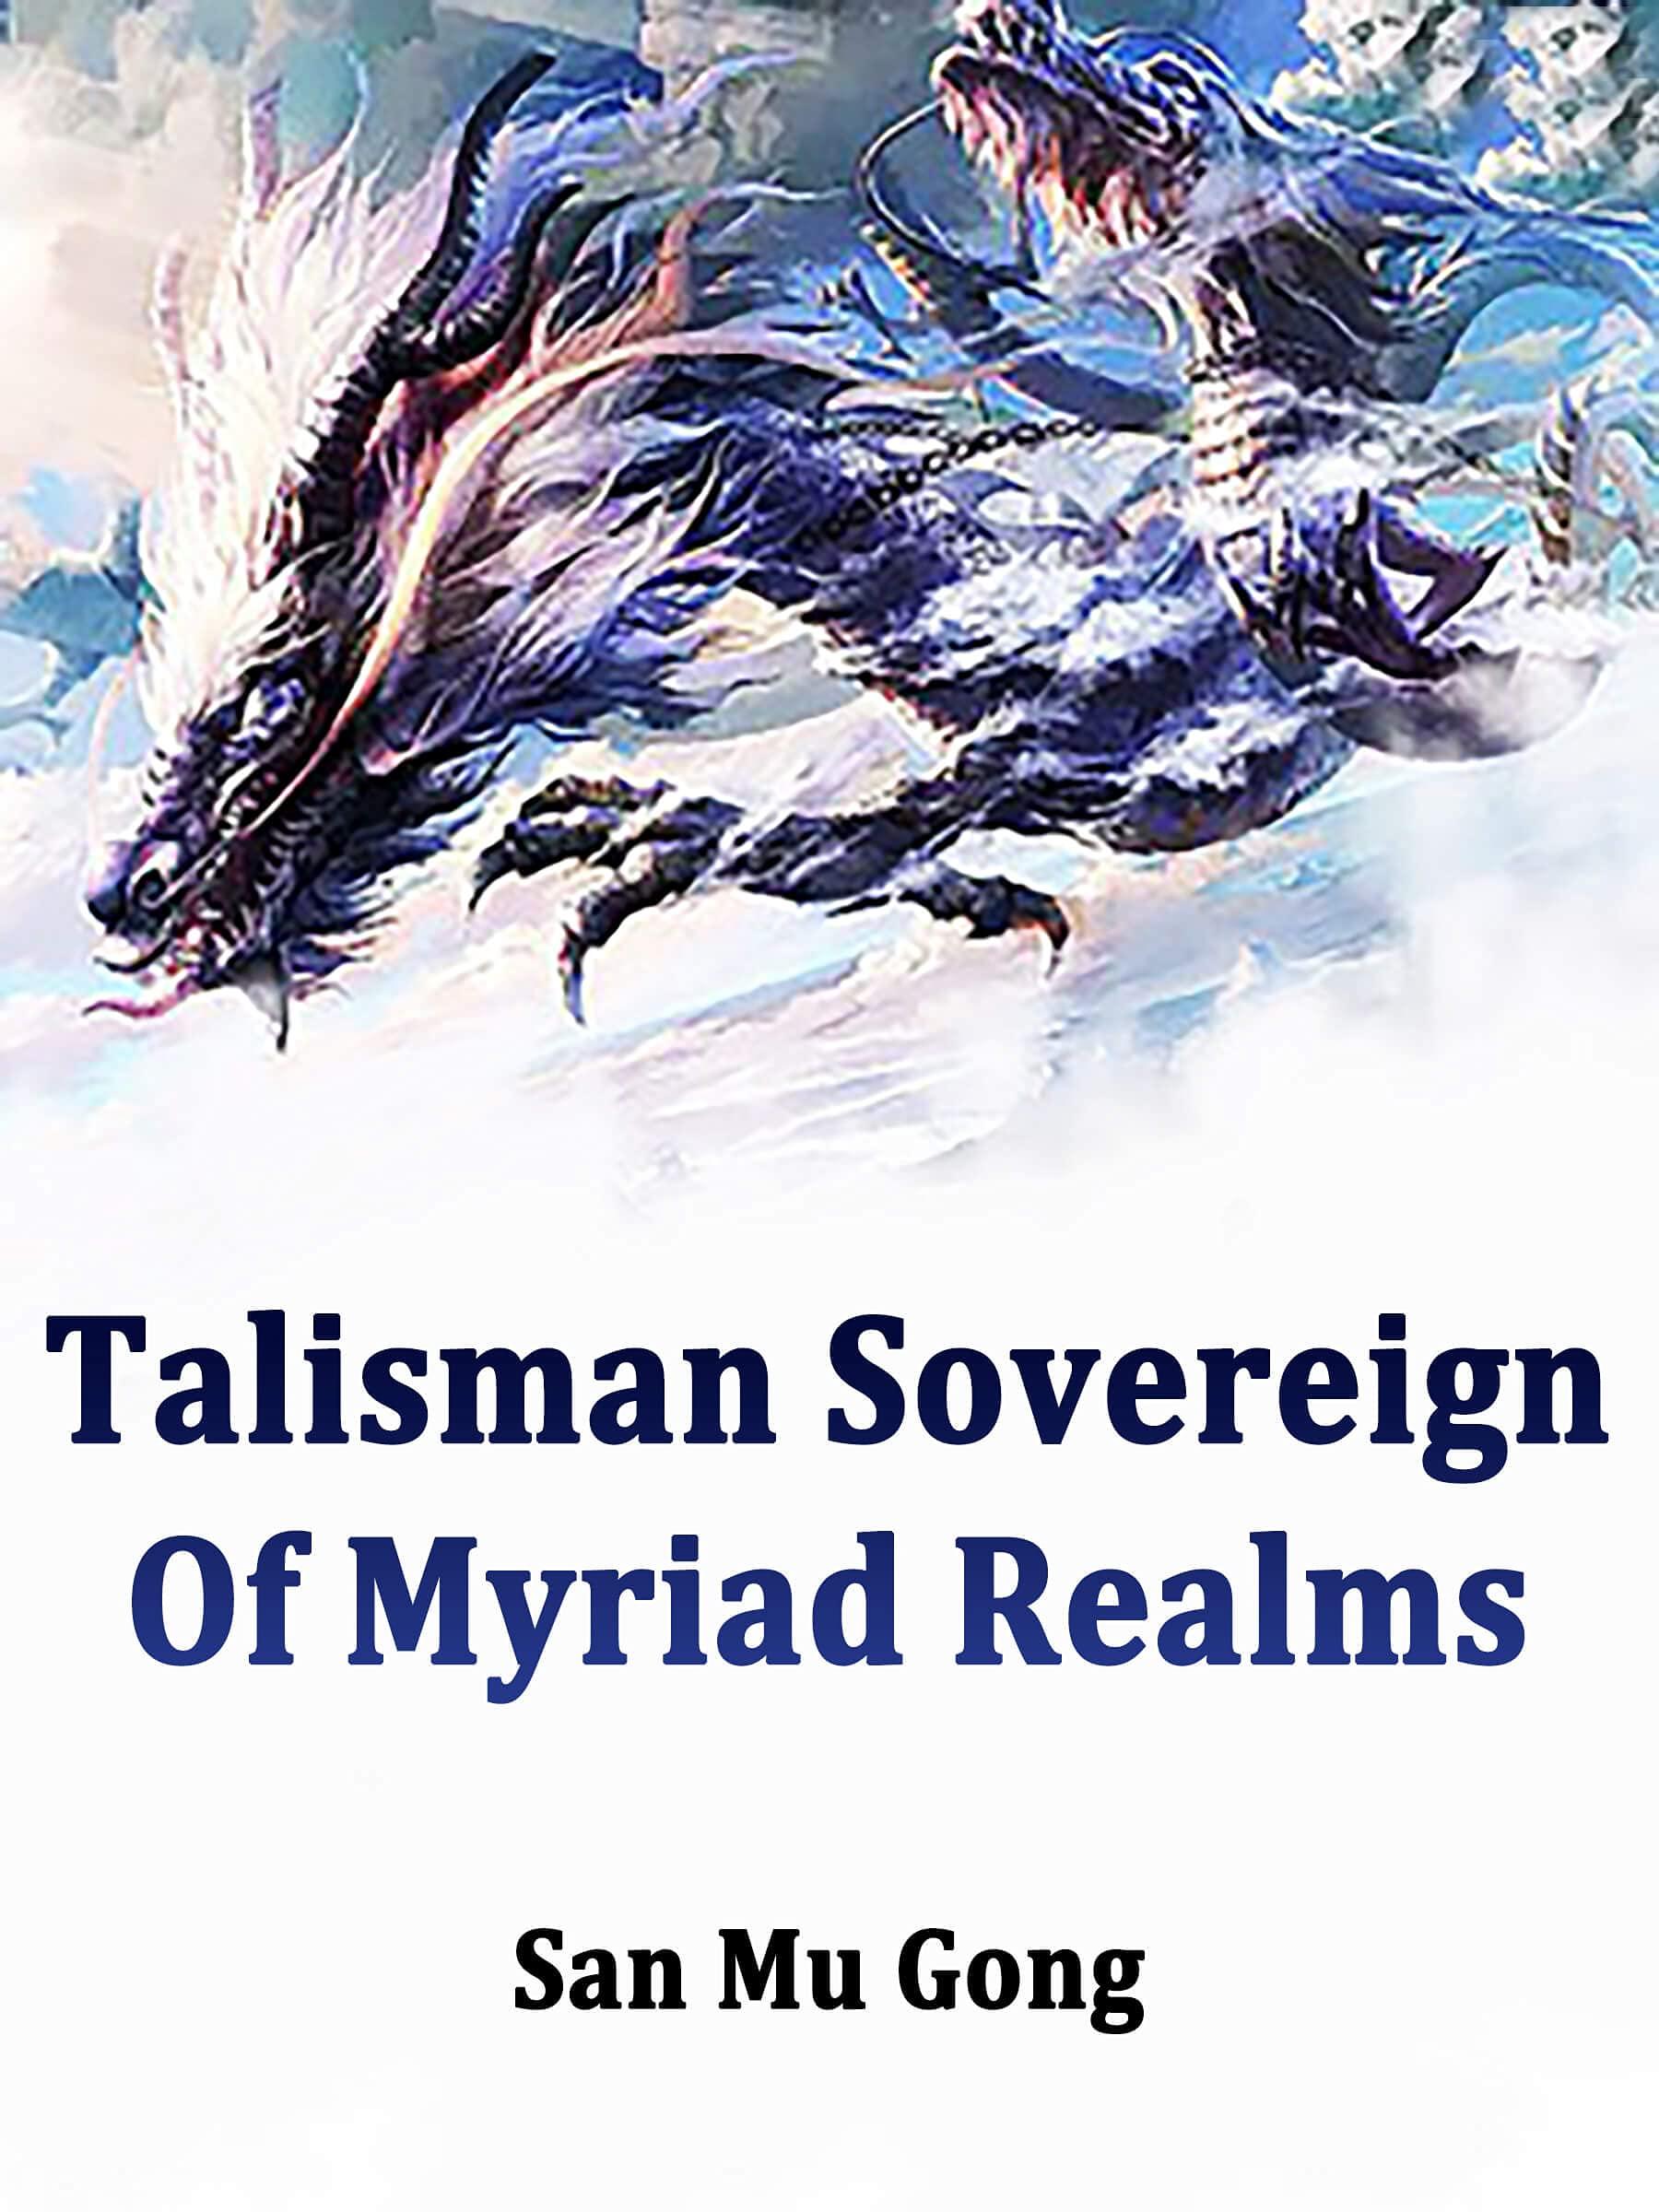 Talisman Sovereign Of Myriad Realms: The teenage superhero fiction and historical fantasy novels ( action adventure, harem for men kindle, cultivation progression ) Book 1